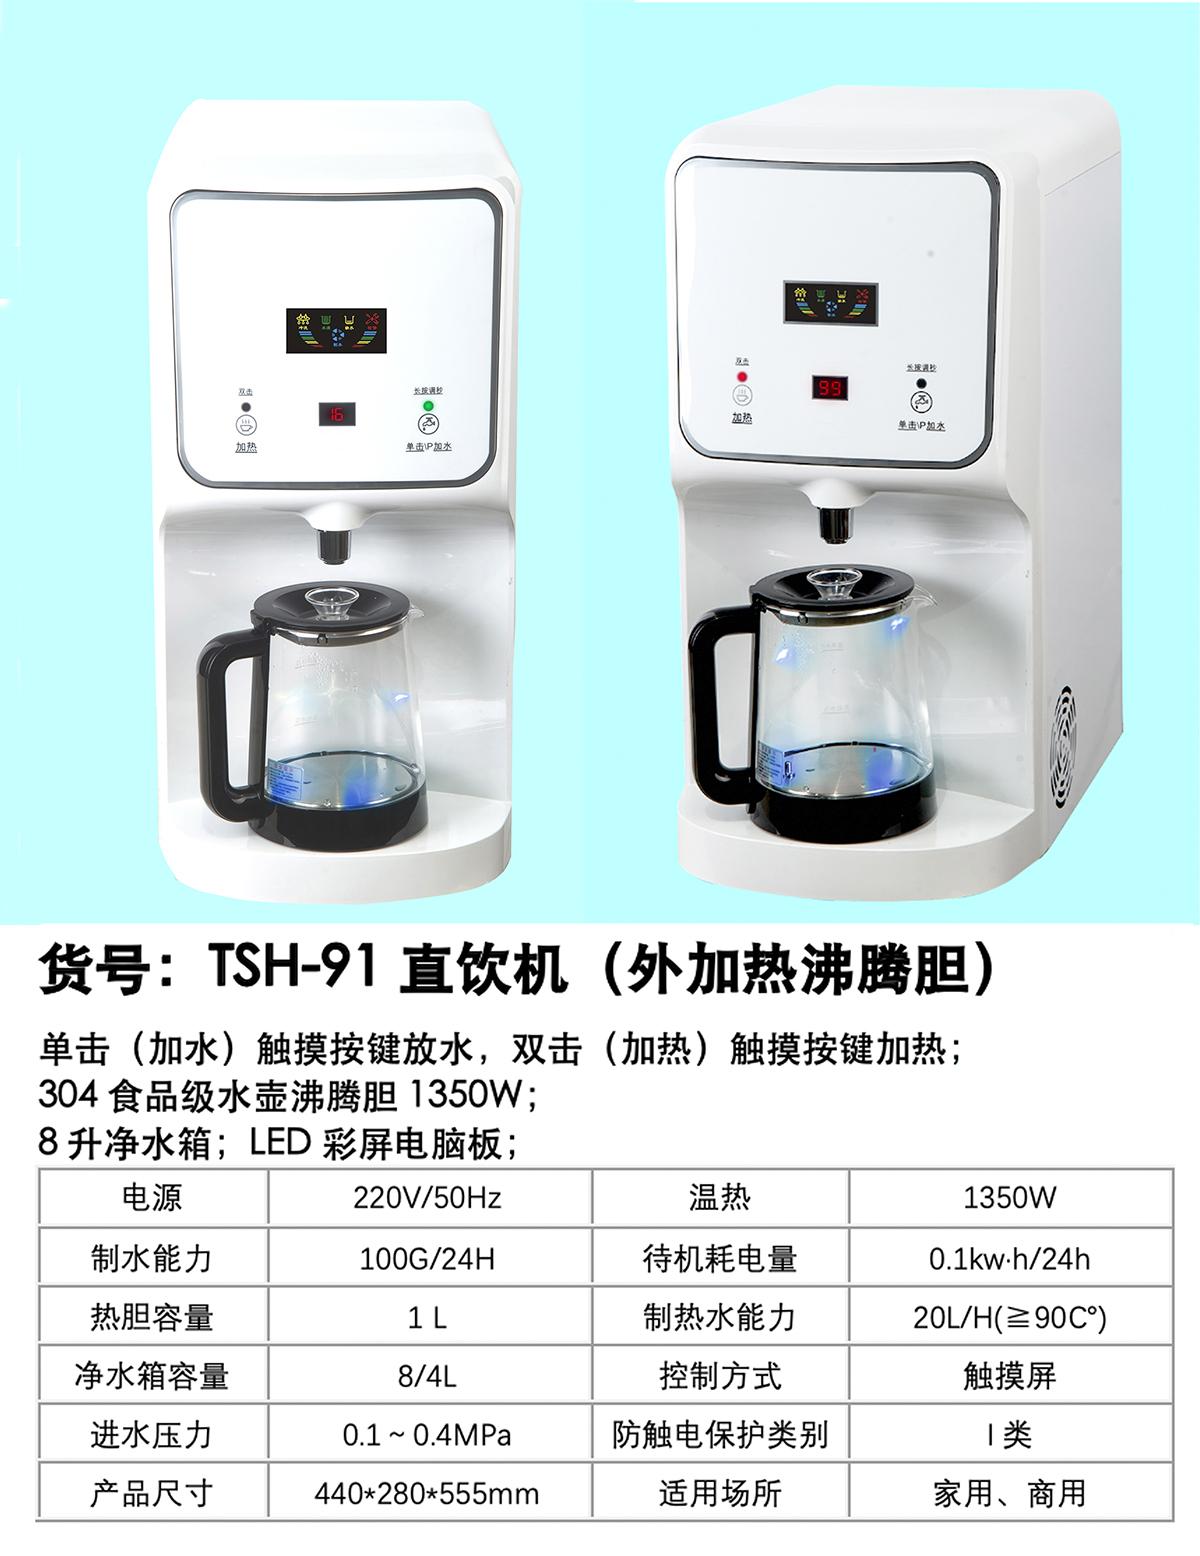 OEM-TSH91带参数.jpg